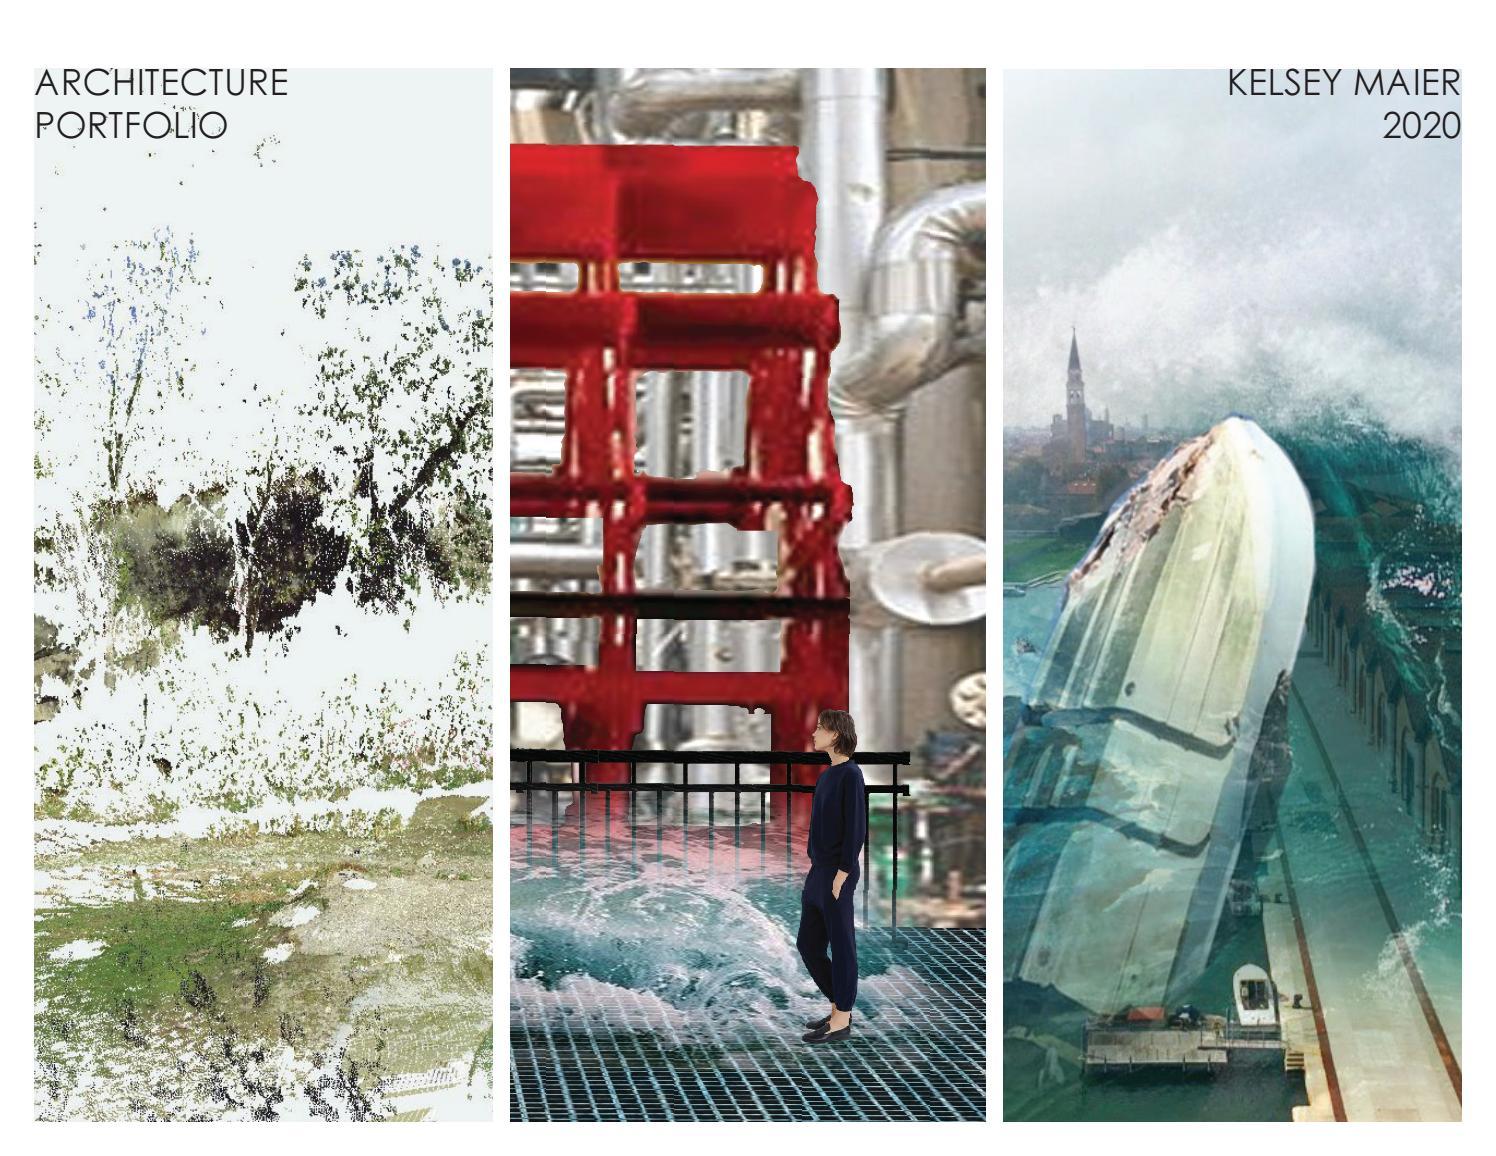 Undergraduate Architecture Portfolio By Kelsey Maier